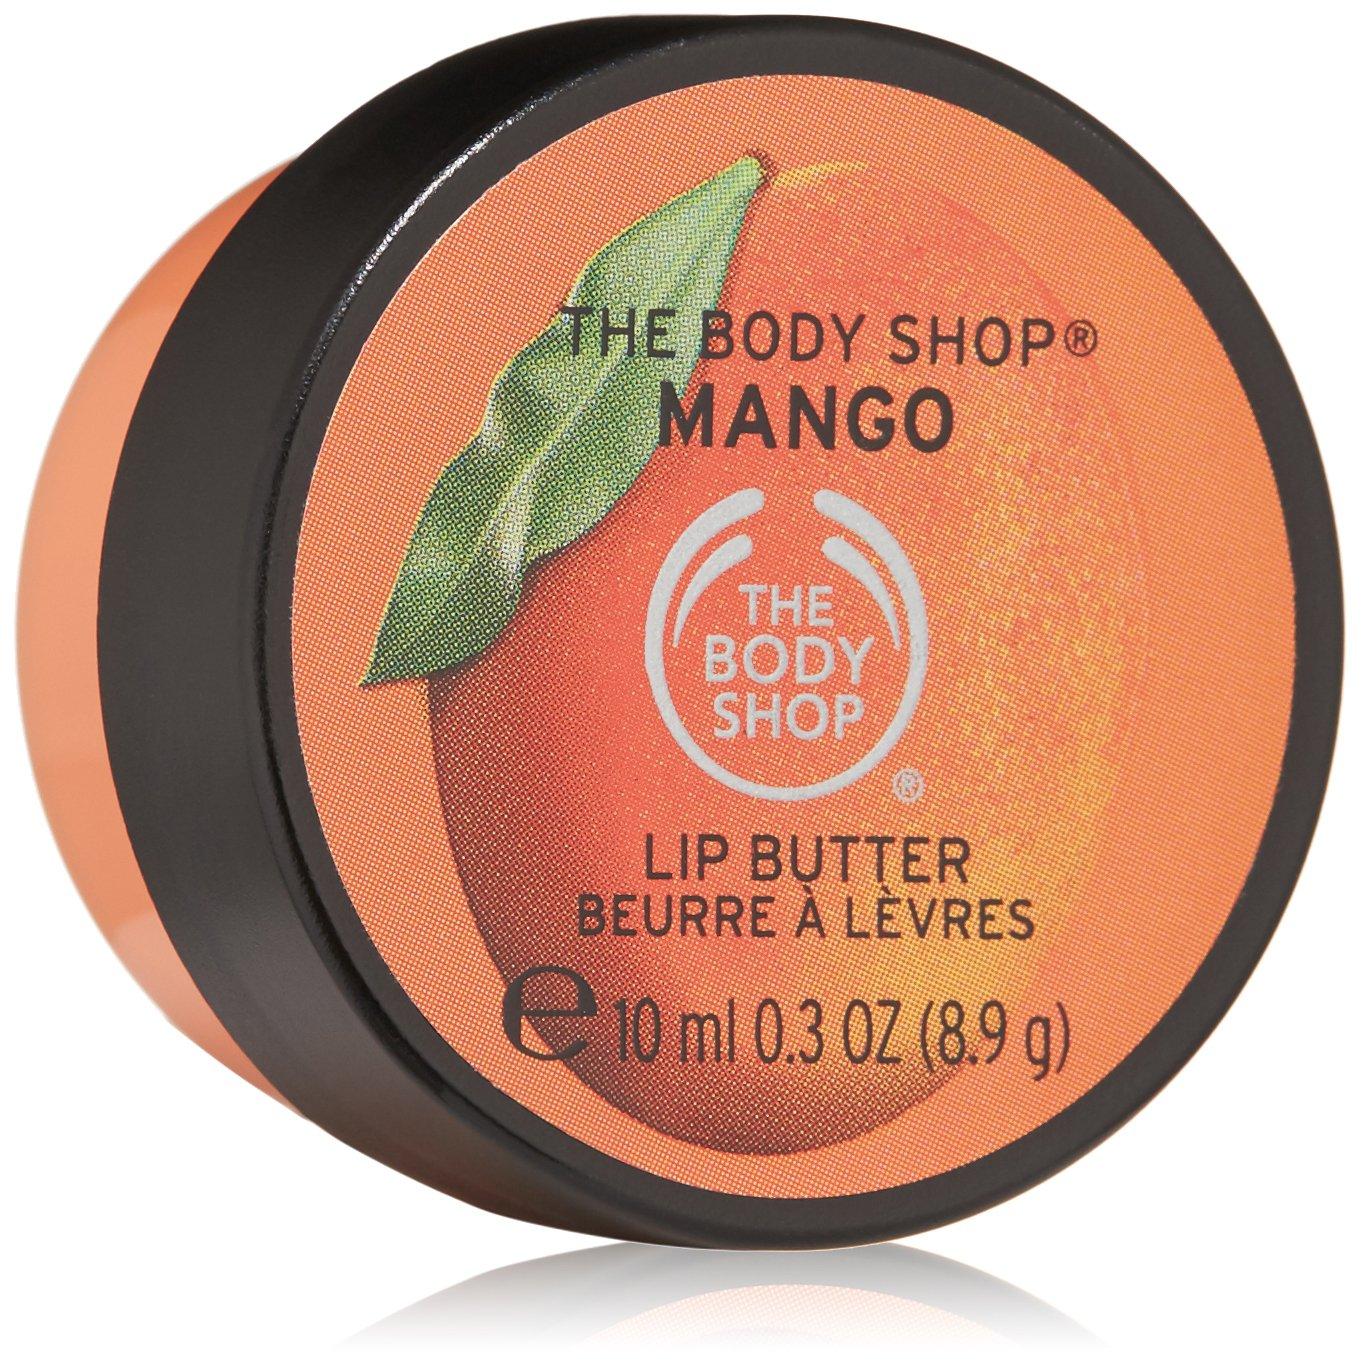 The Body Shop Mango Lip Butter - 10ml by The Body Shop